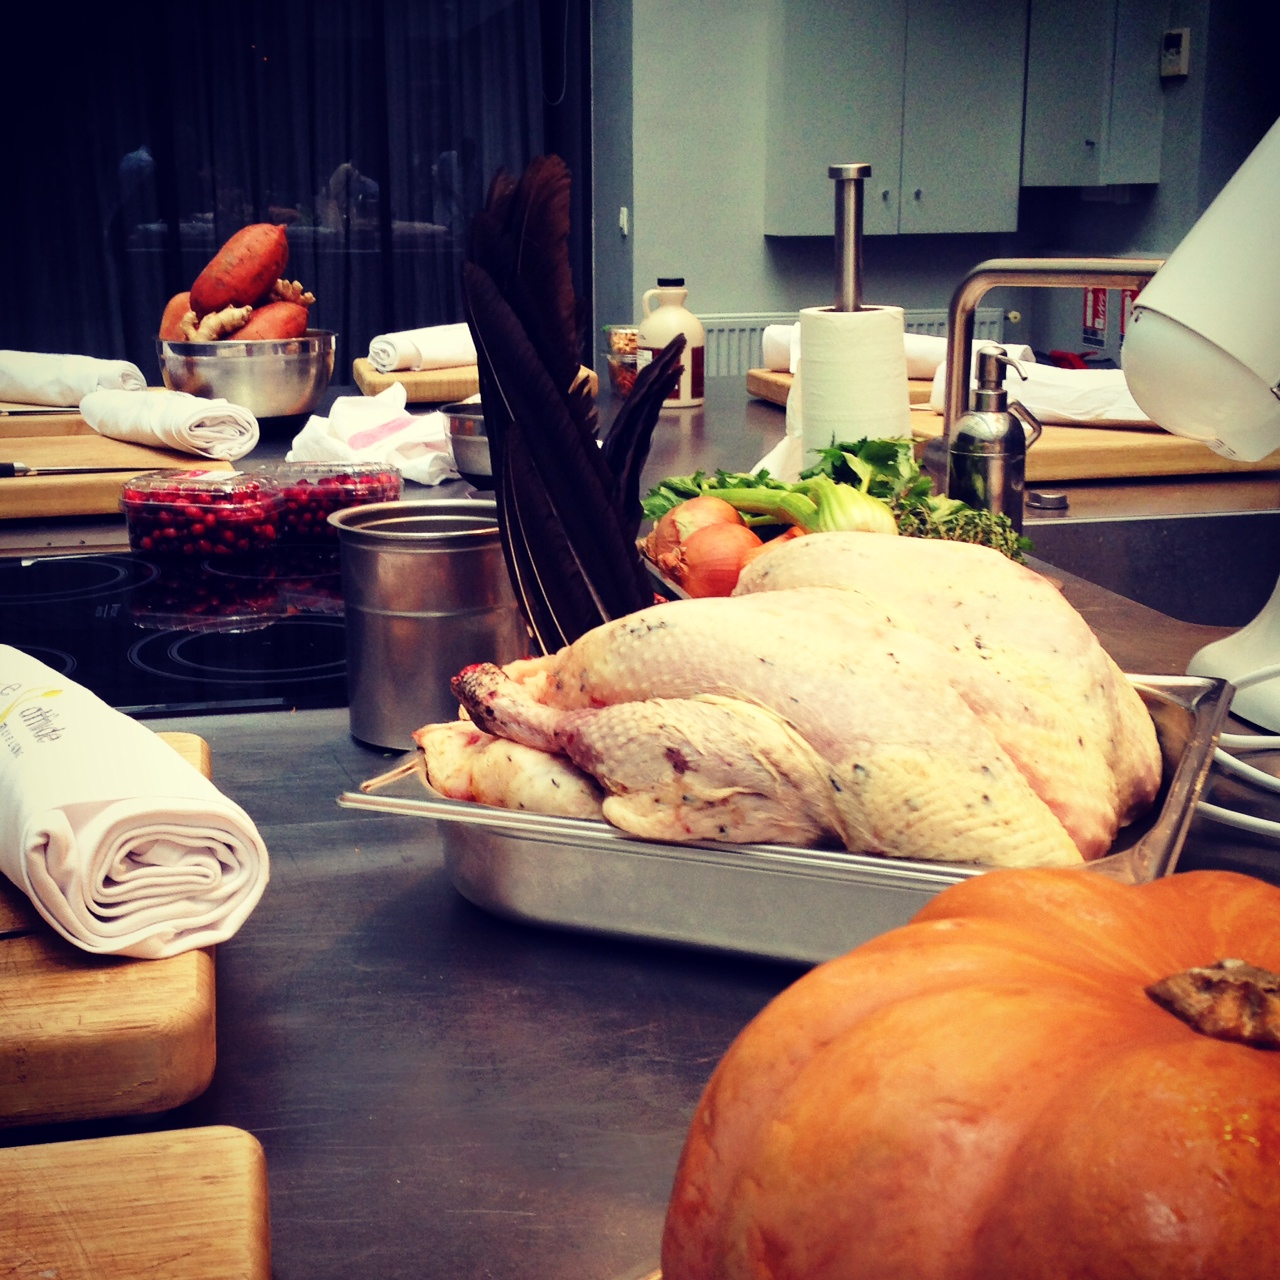 Happy thanksgiving le blog de cyril lignac - Cuisine attitude lignac ...